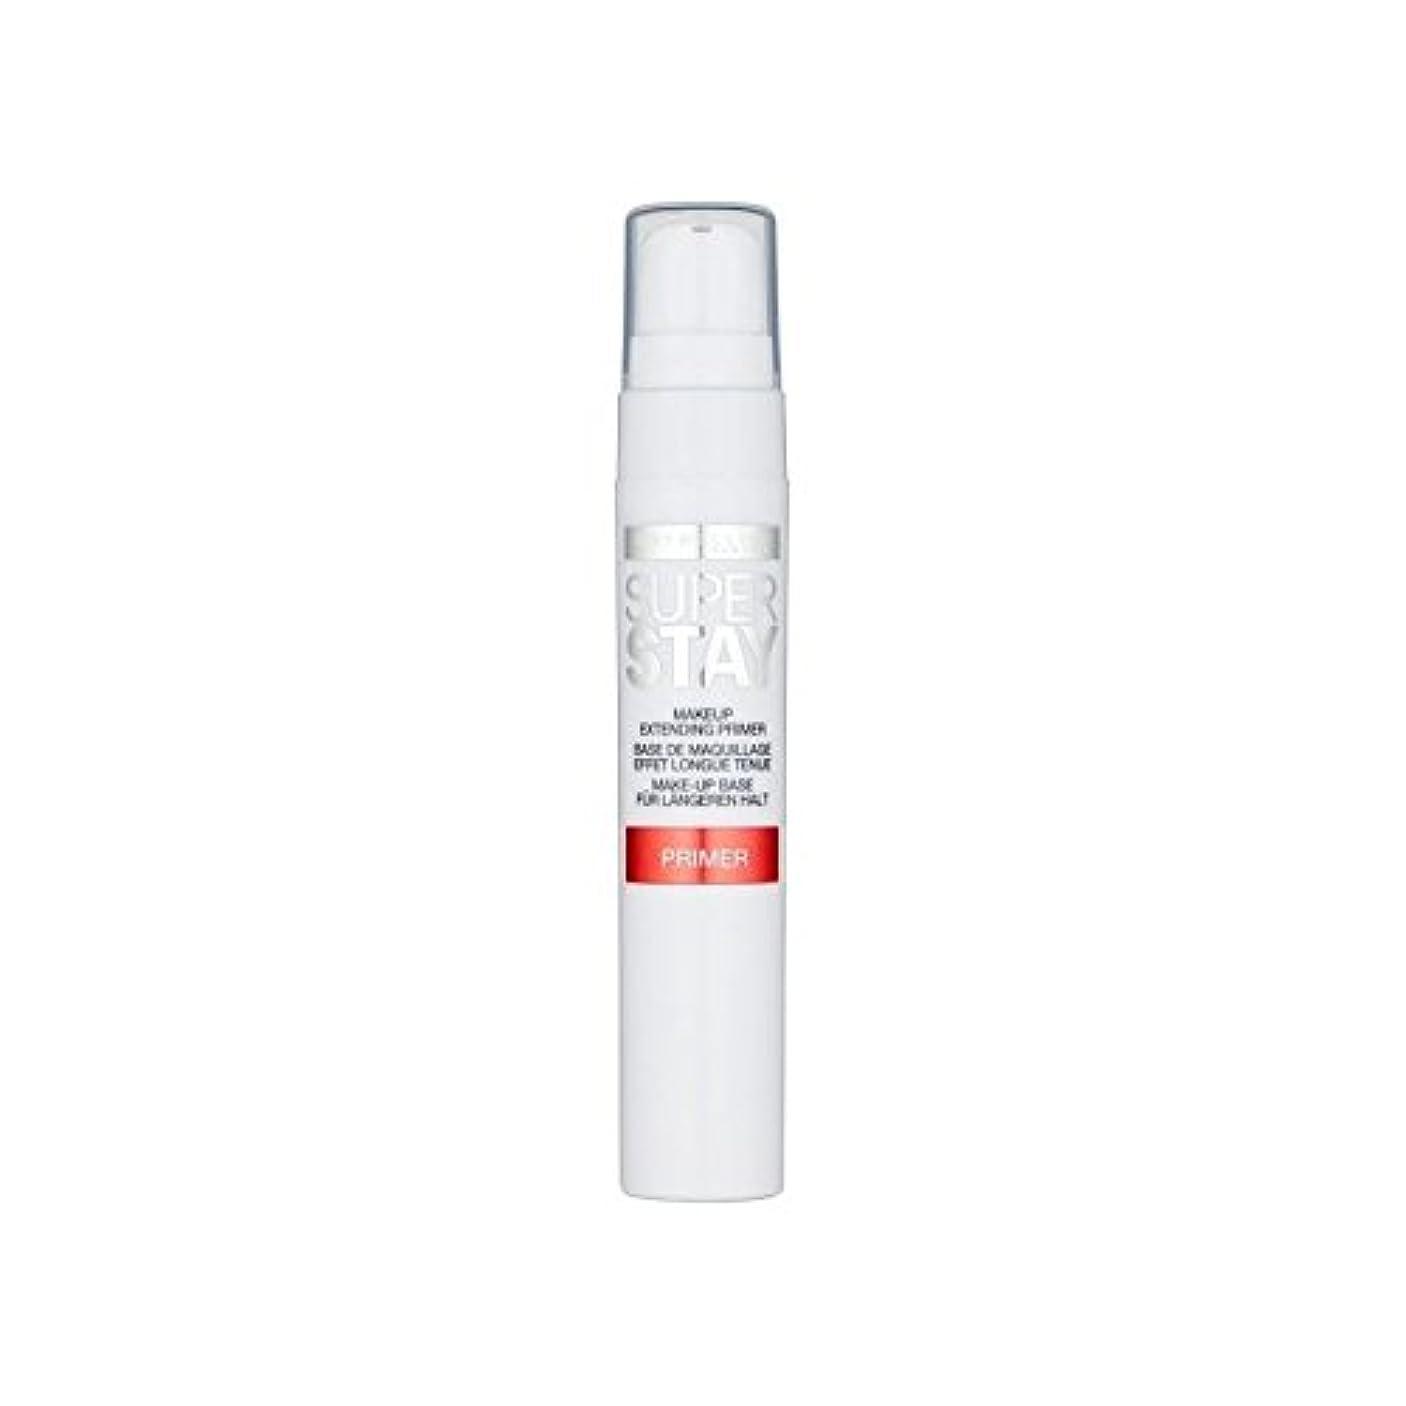 Maybelline Face Superstay 24H Primer - メイベリン顔 24とプライマー [並行輸入品]